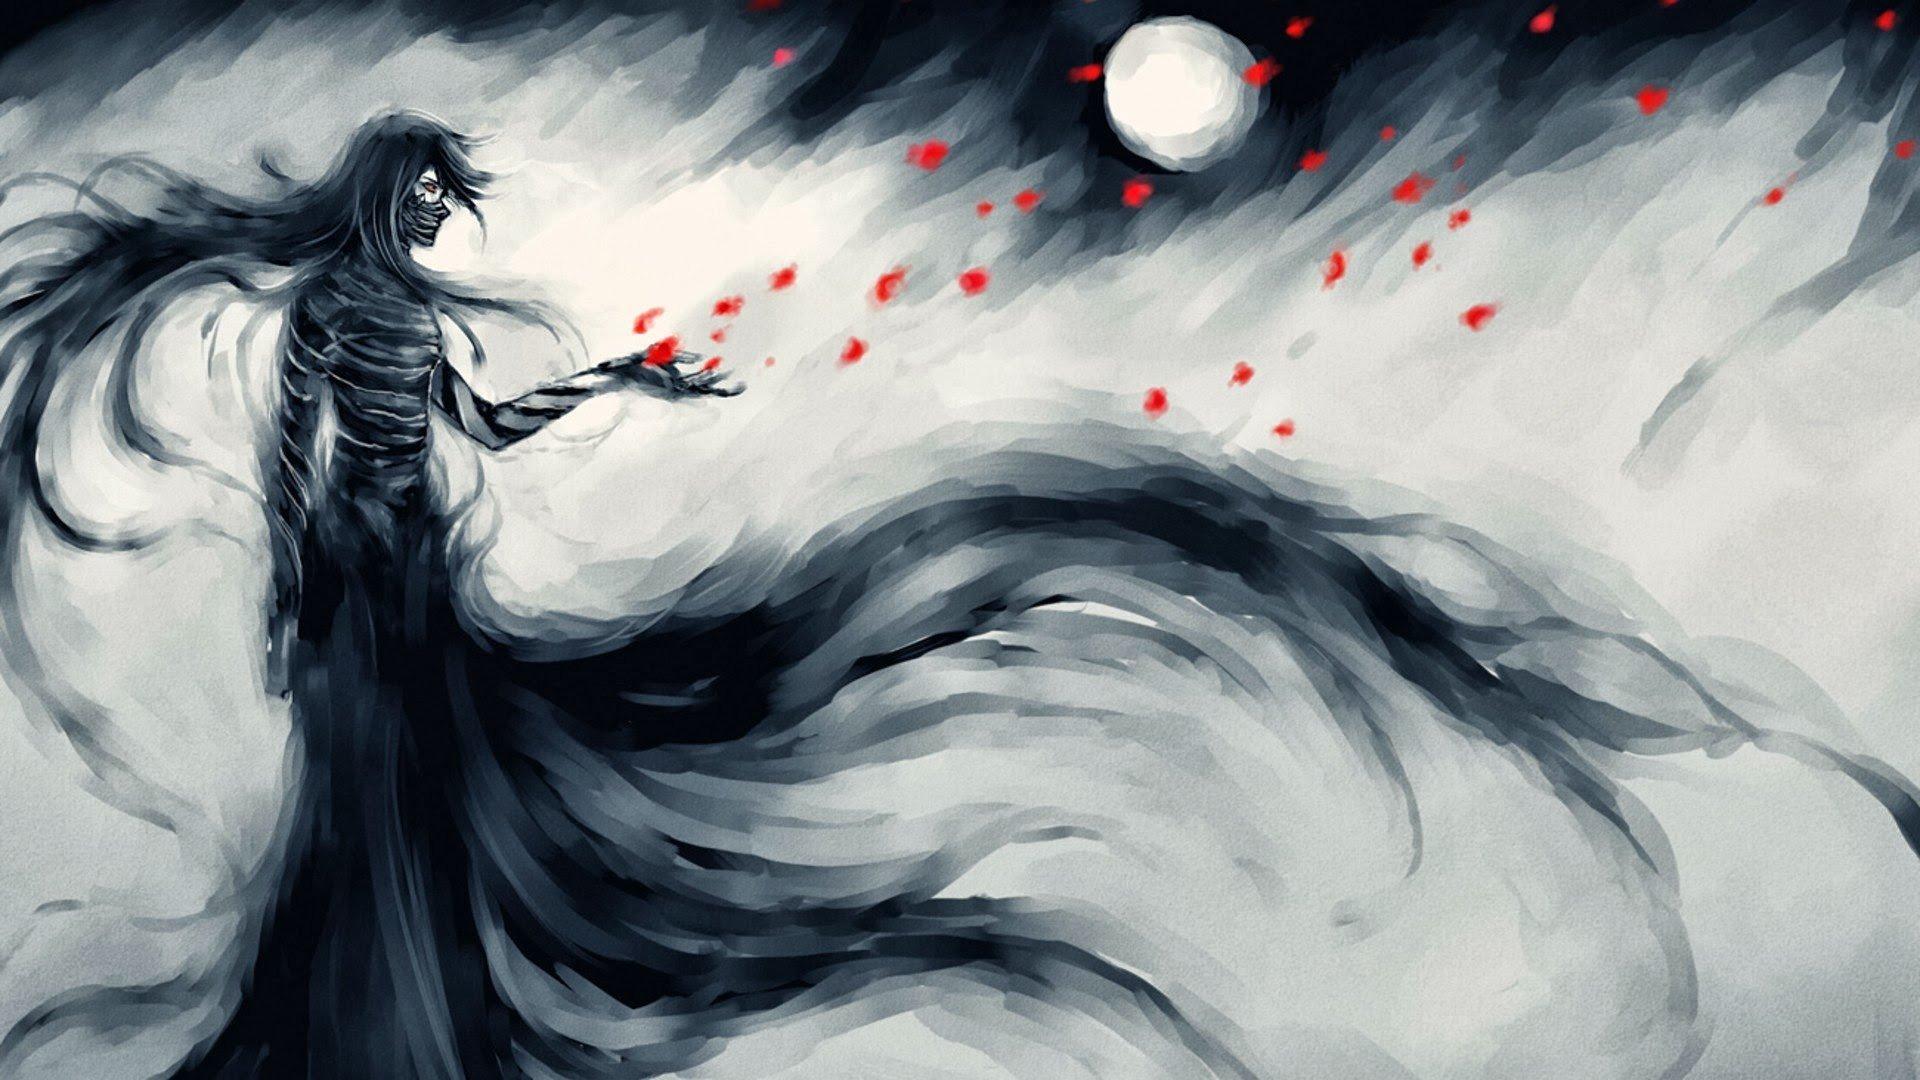 Bleach, Kurosaki Ichigo, Flower petals, NanFe, Fan art, Mugetsu, Petals, Bandage Wallpaper